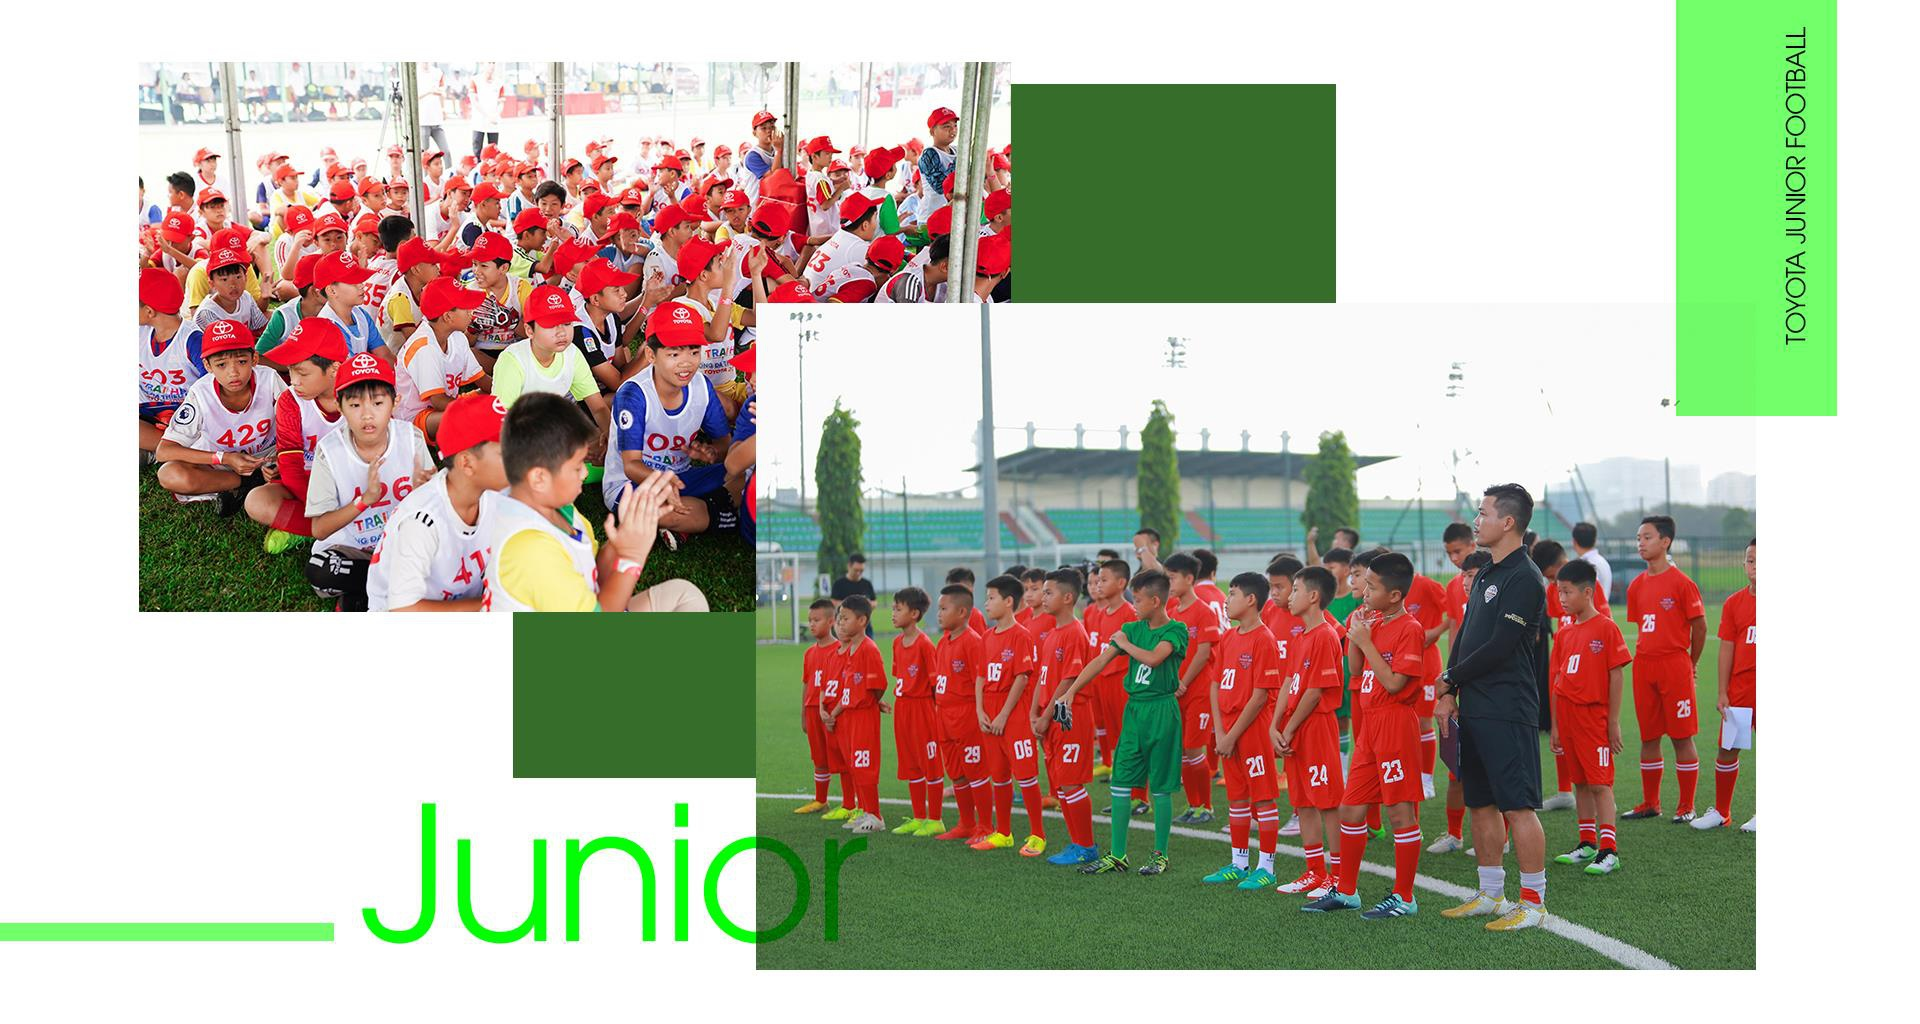 Toyota Junior Football - hanh trinh 'gieo uoc mo' cho cac cau thu nhi hinh anh 4